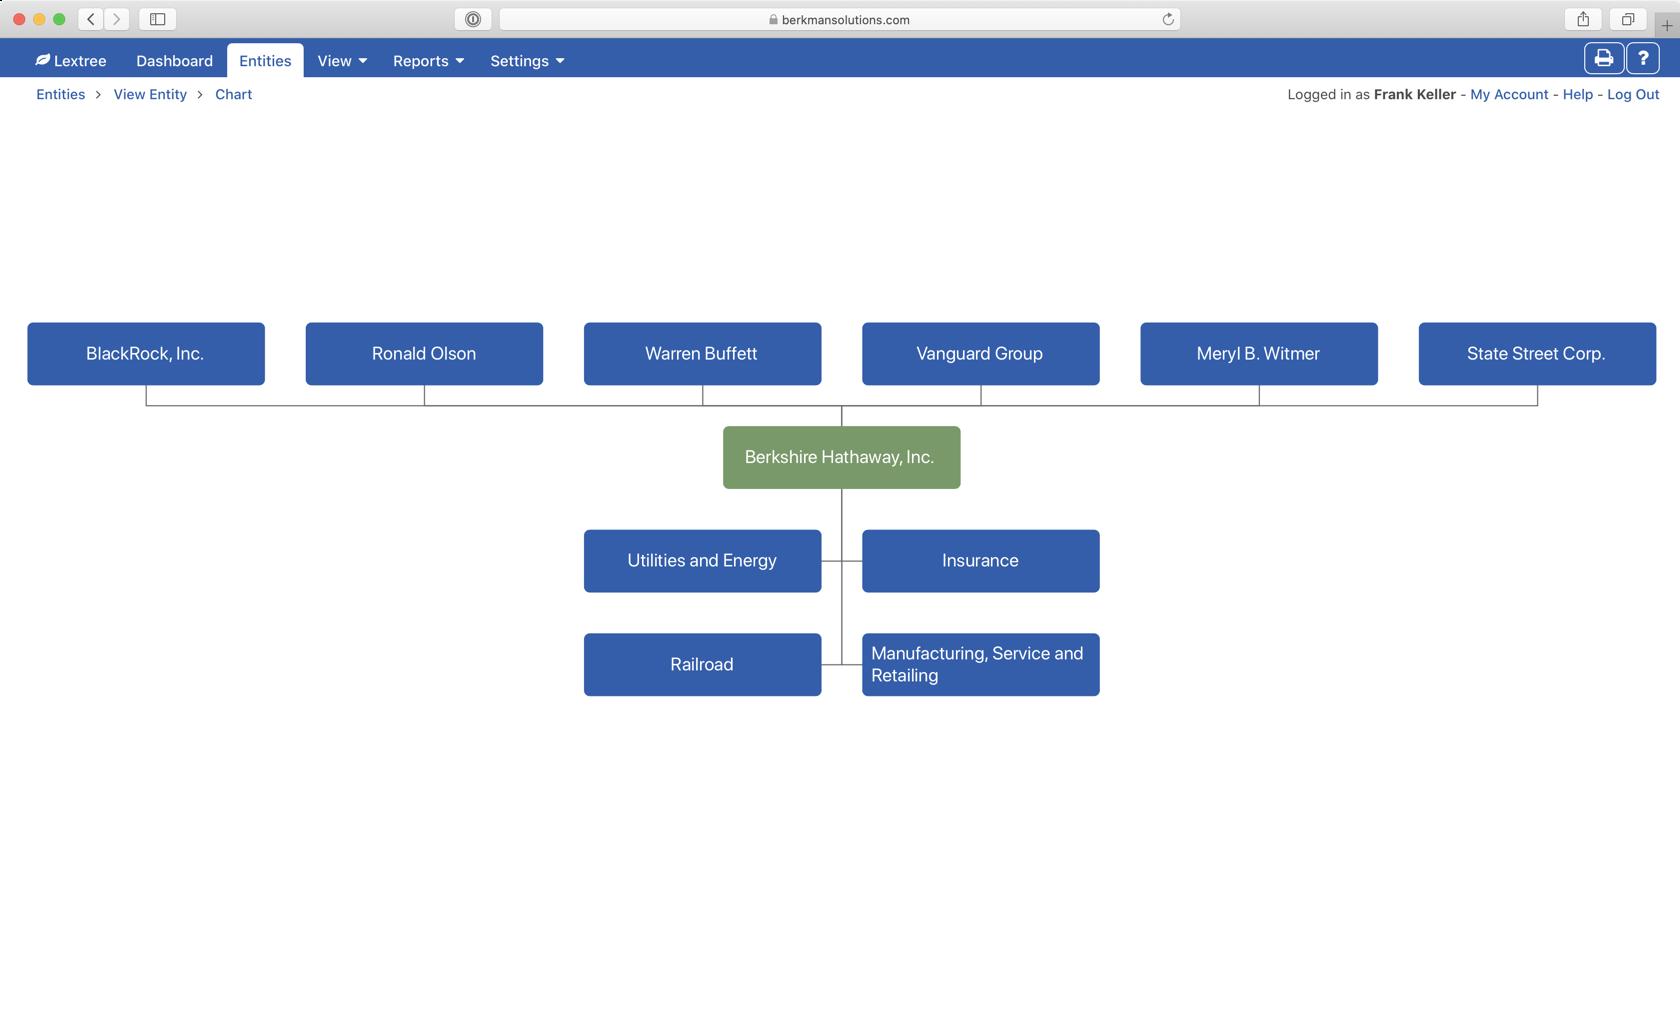 Org chart of Berkshire Hathaway segments